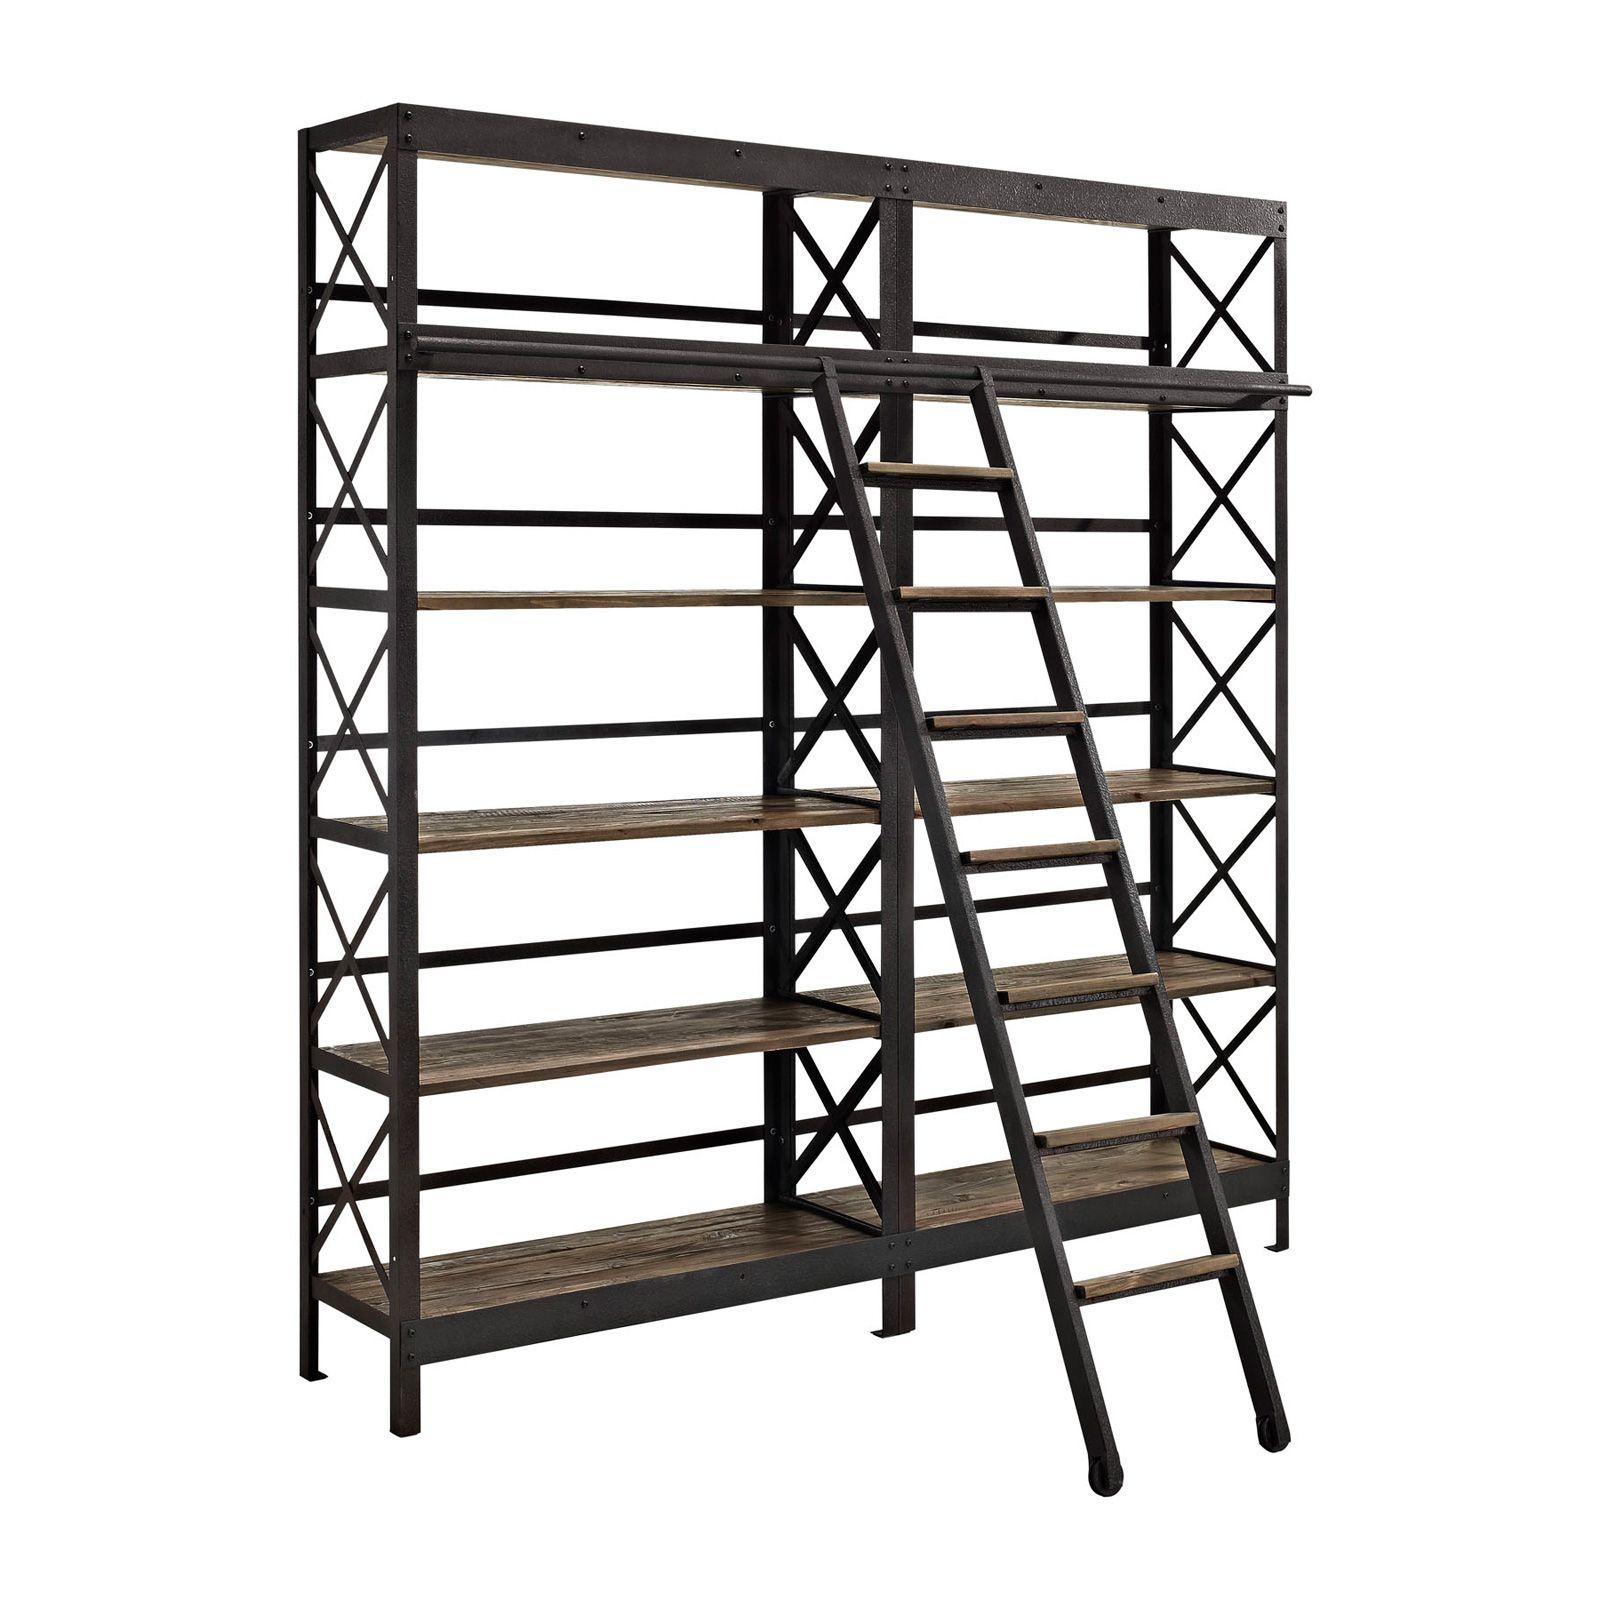 Modway Furniture Eei 1215 Brn Set Headway Wood Bookshelf In